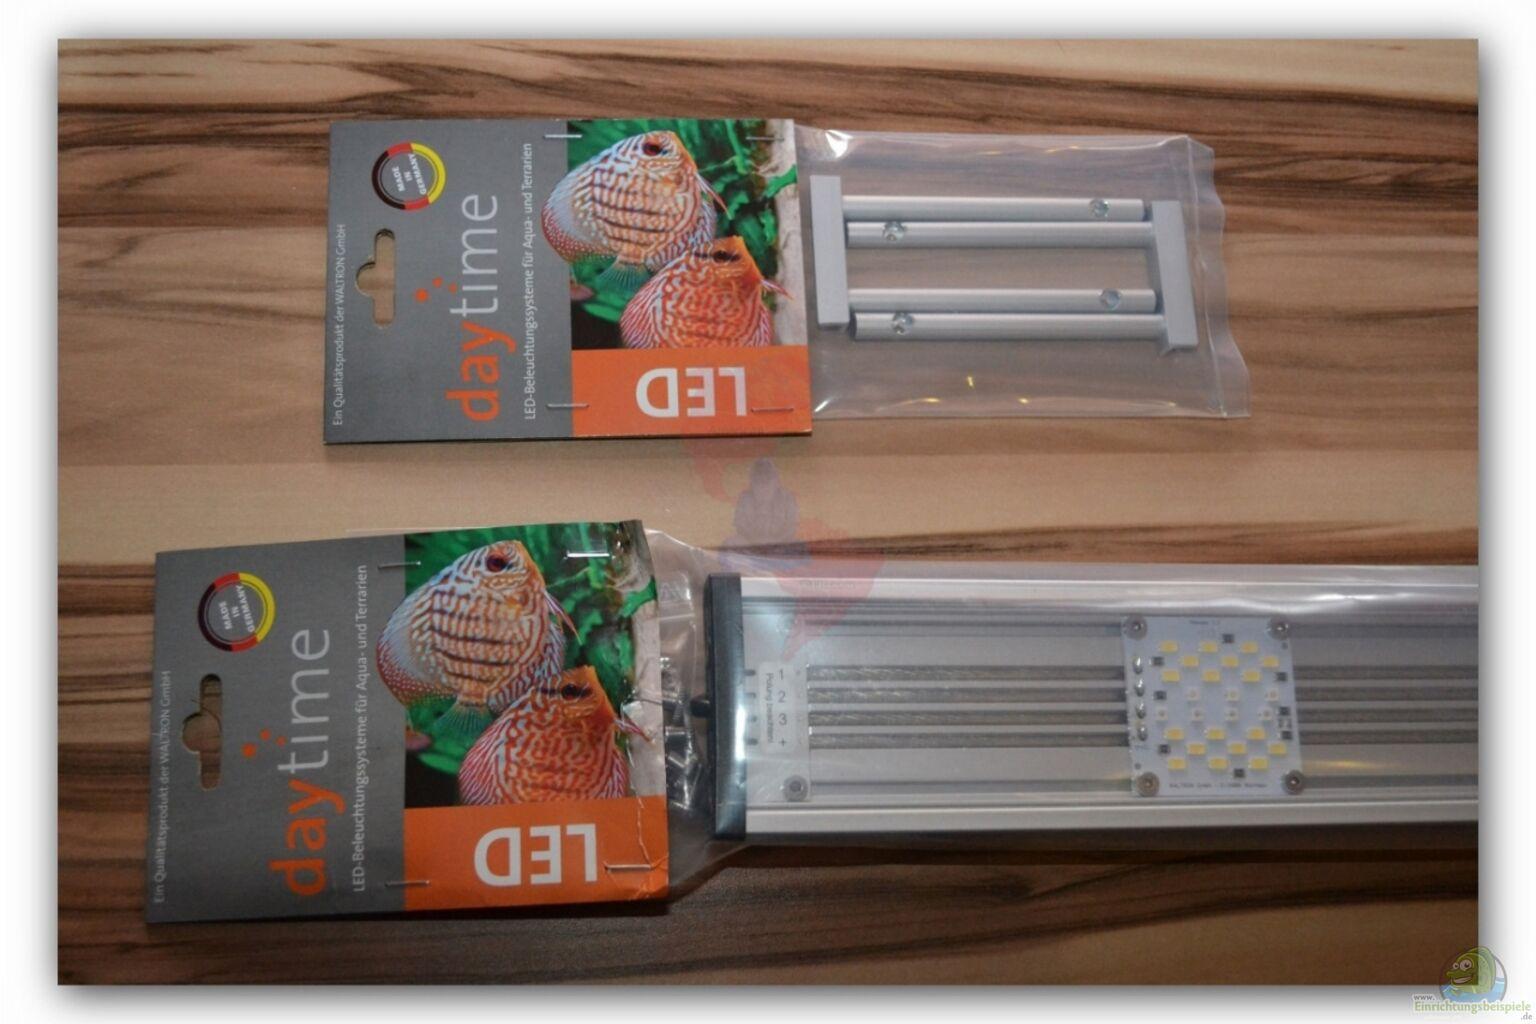 mich s stiftung aqua test daytime cluster control 120 4 led lampe. Black Bedroom Furniture Sets. Home Design Ideas